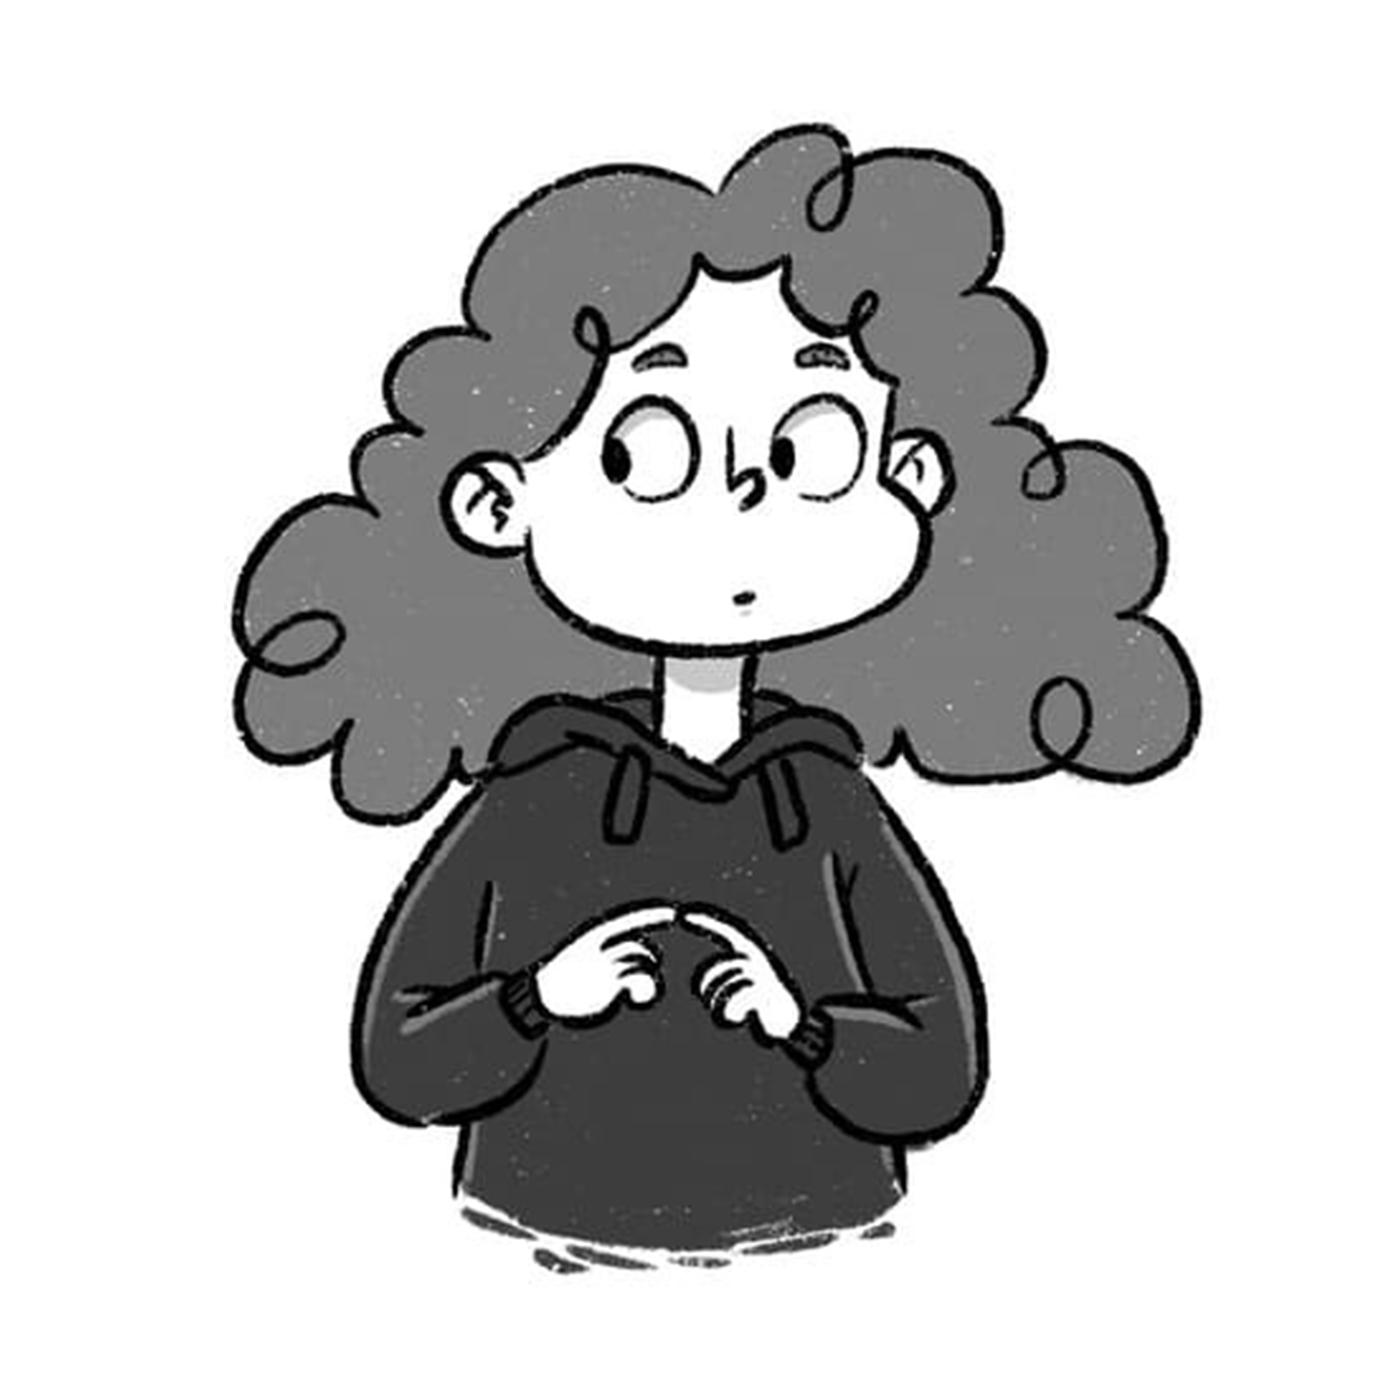 lea schumm drawn by herself as herself